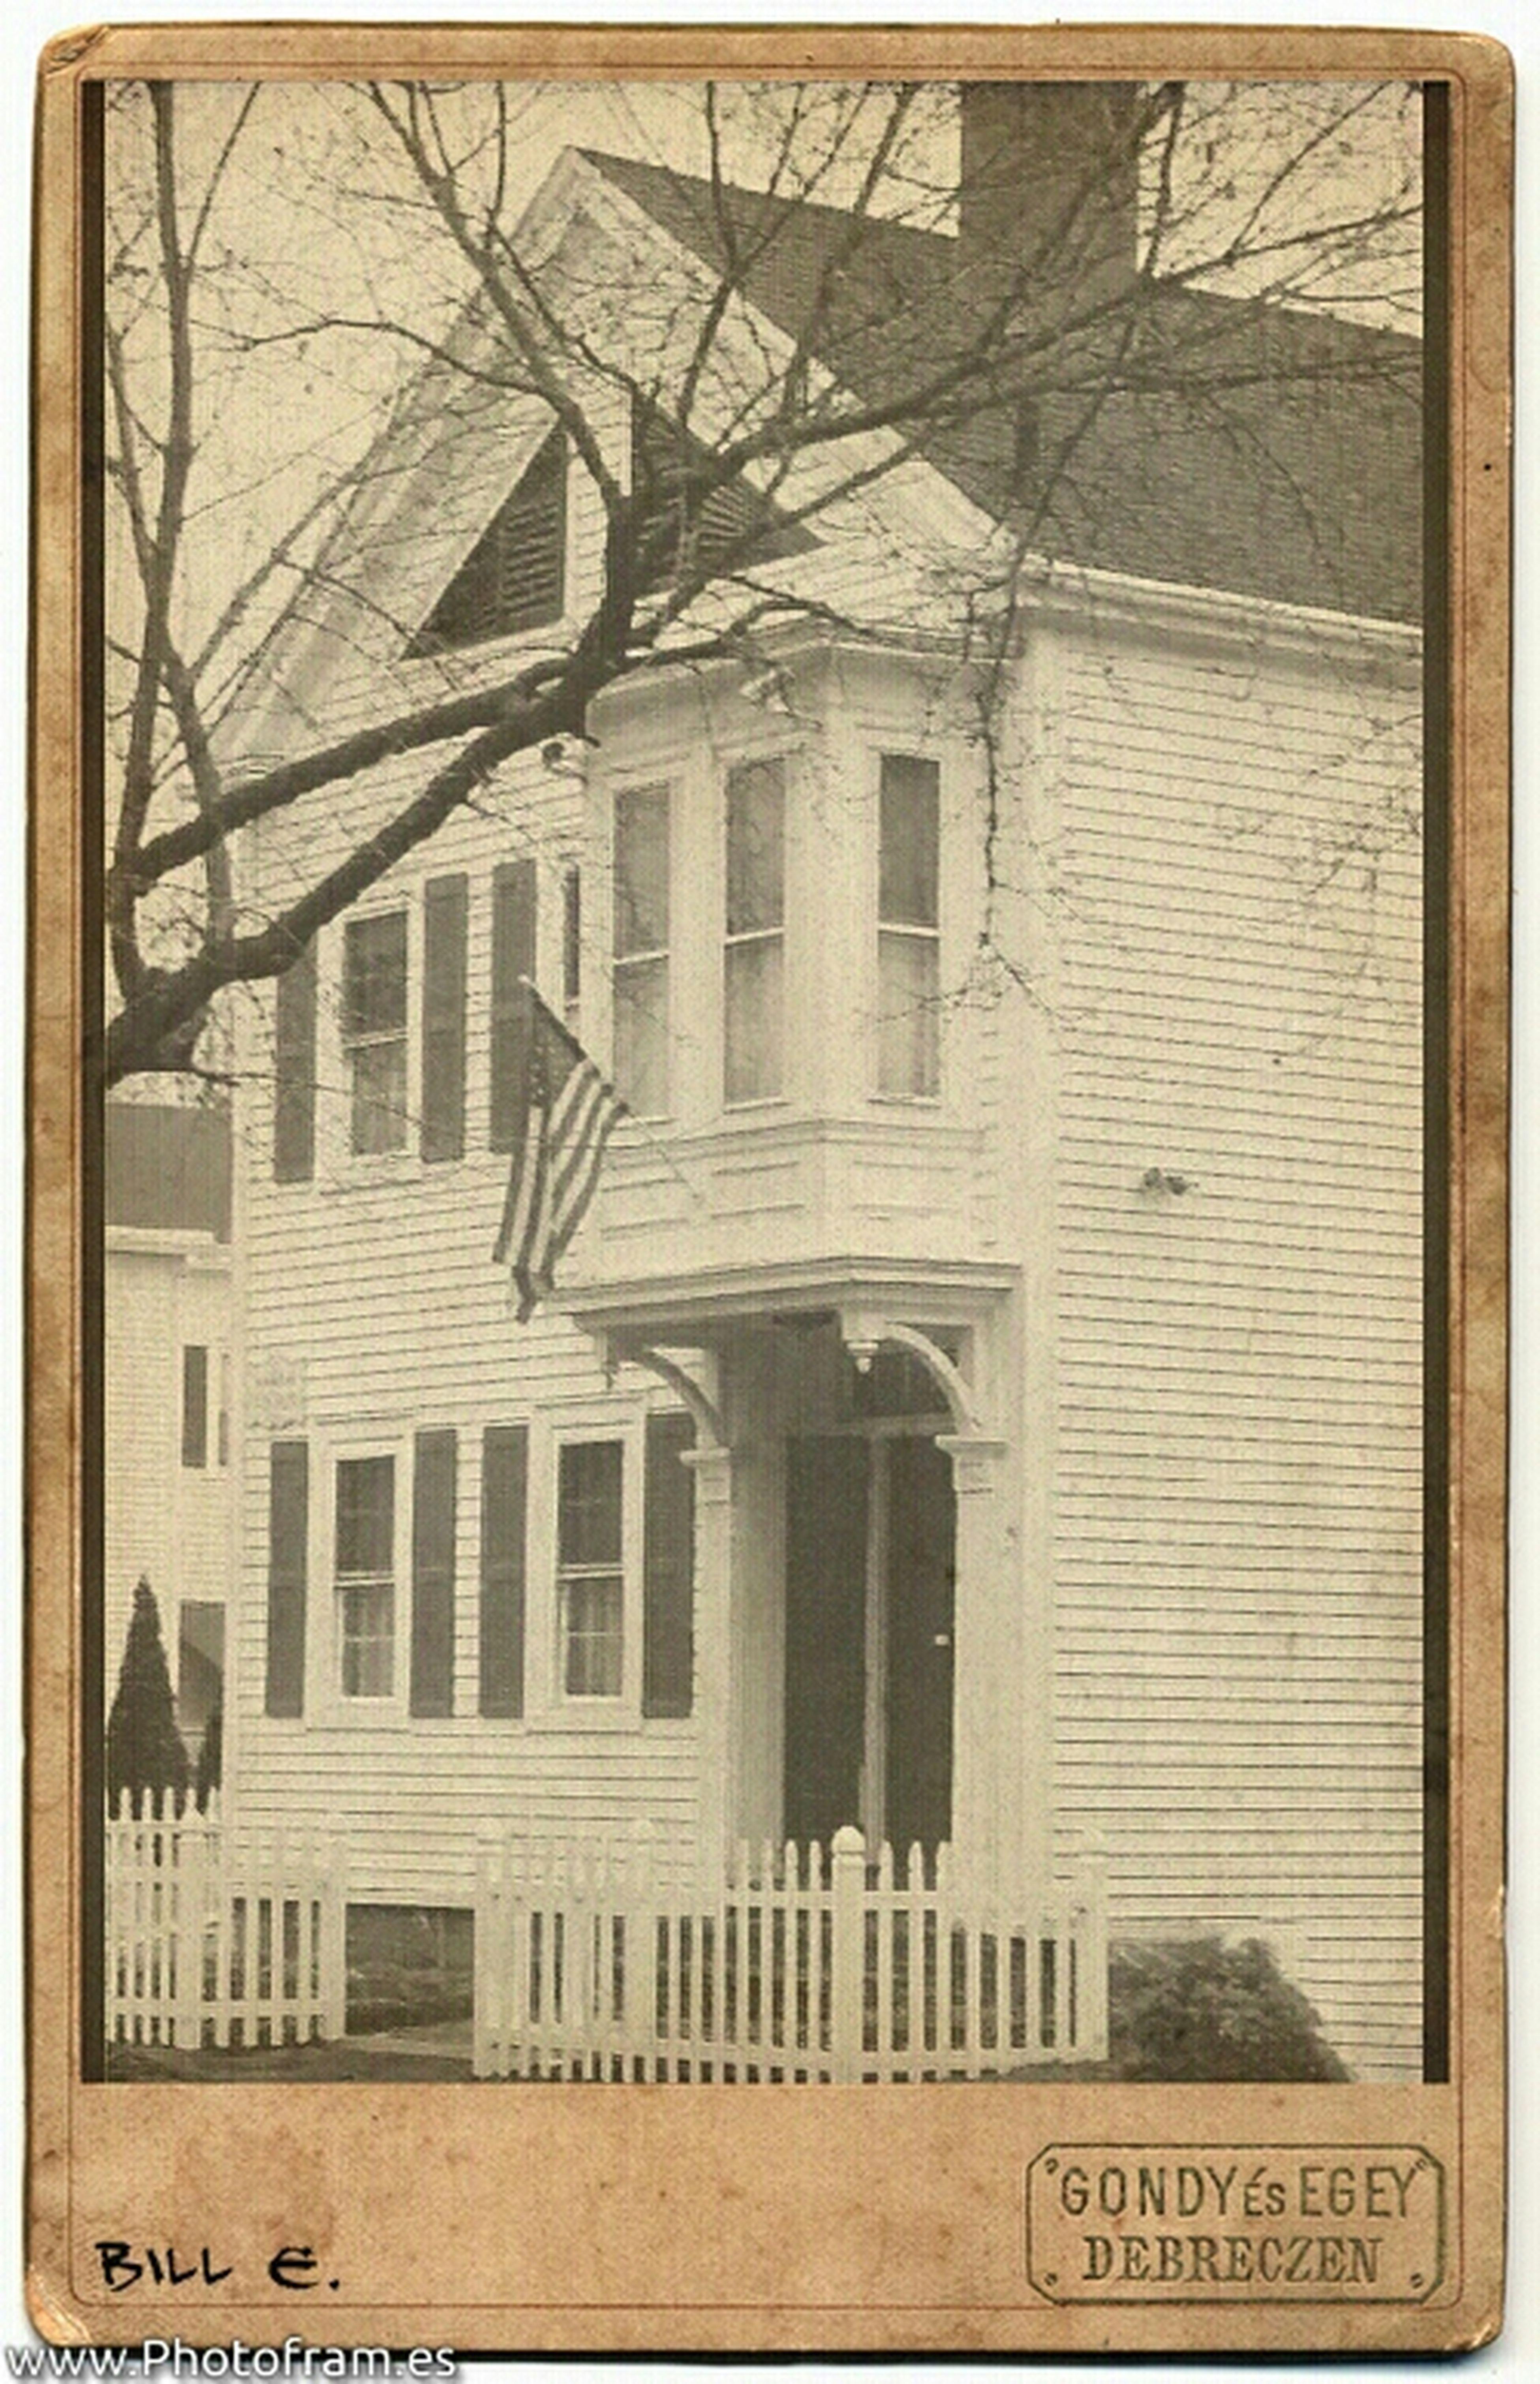 Histotic Home, Salem, Ma.